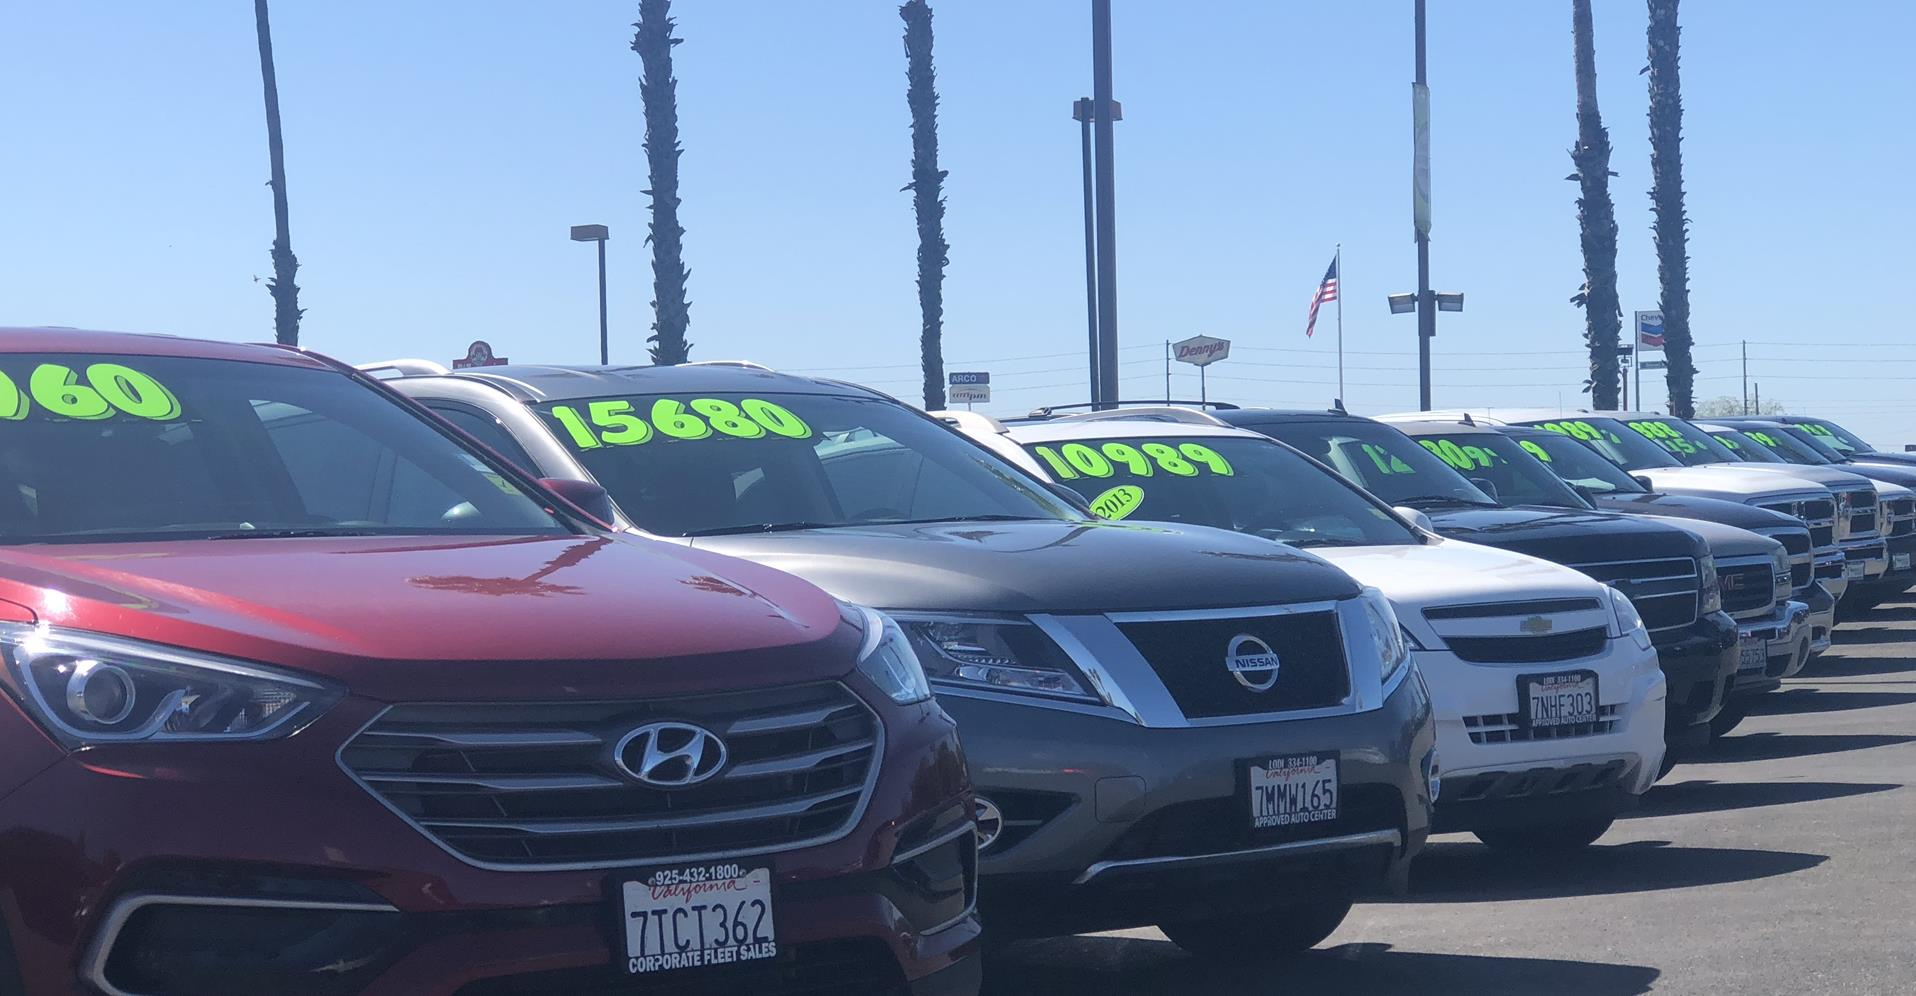 Approved Auto Center of Lodi Lodi CA   New & Used Cars Trucks Sales & Service